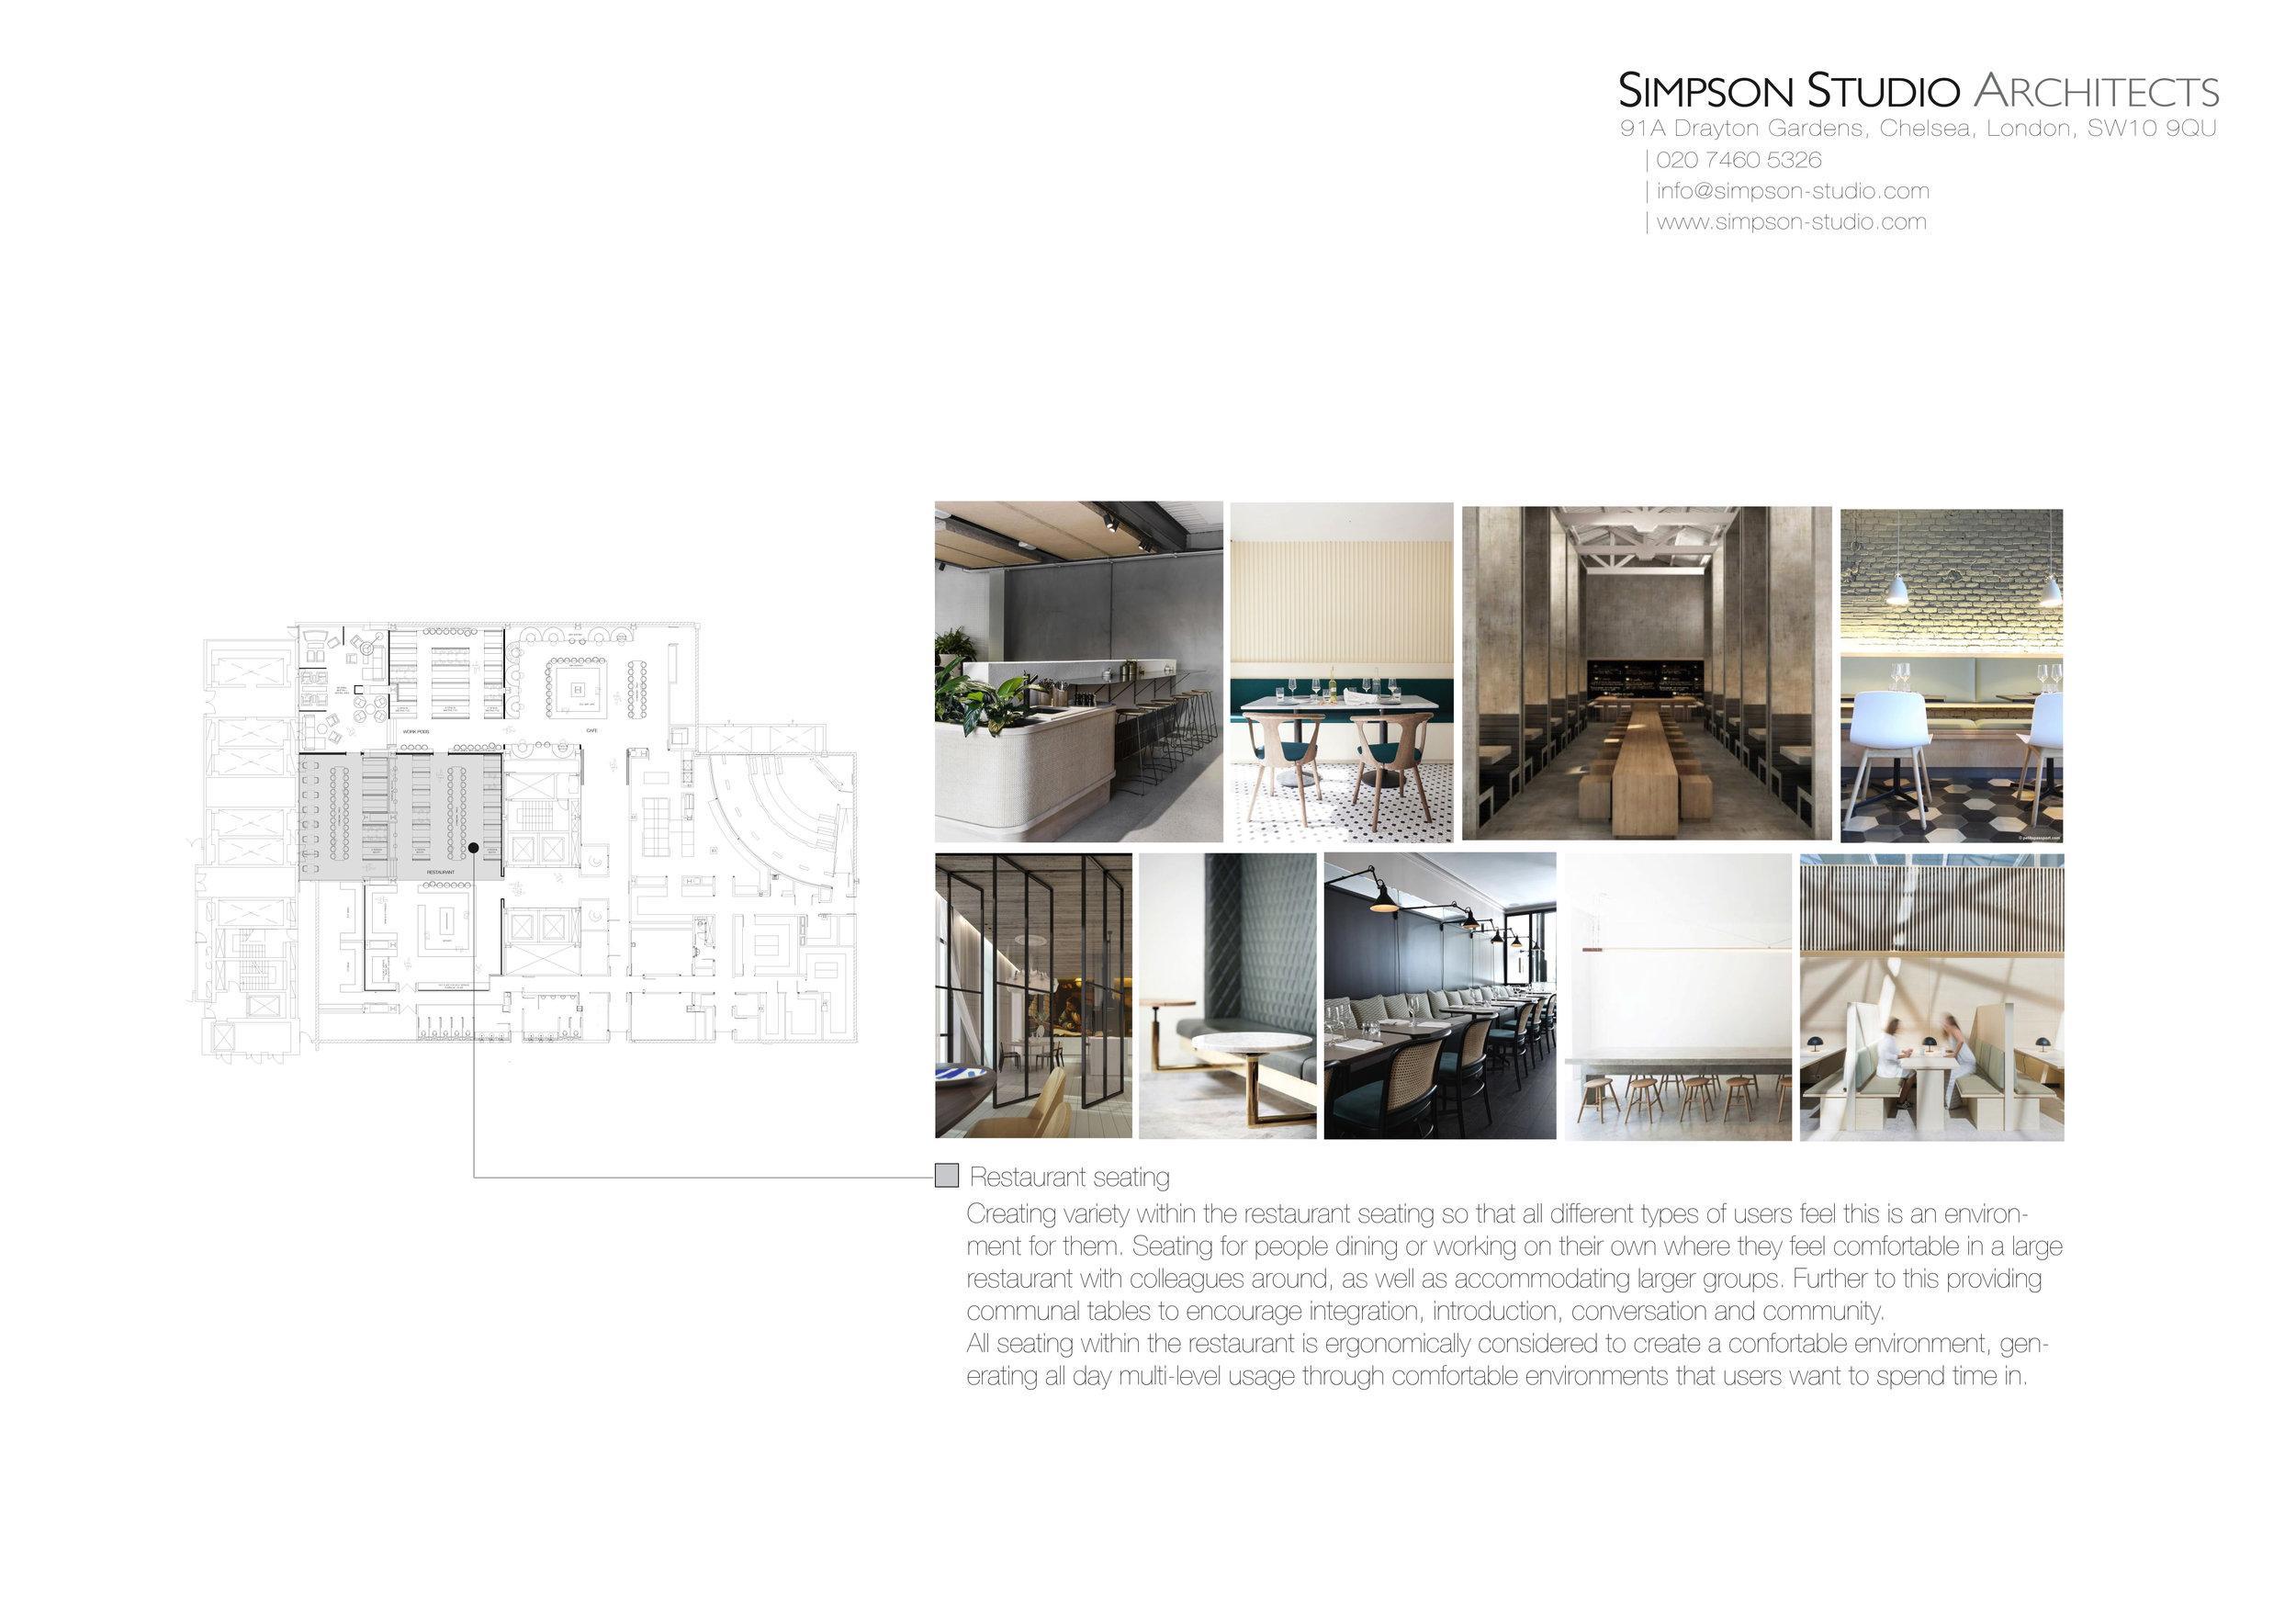 1608_Restaurant Concepts-4.jpg